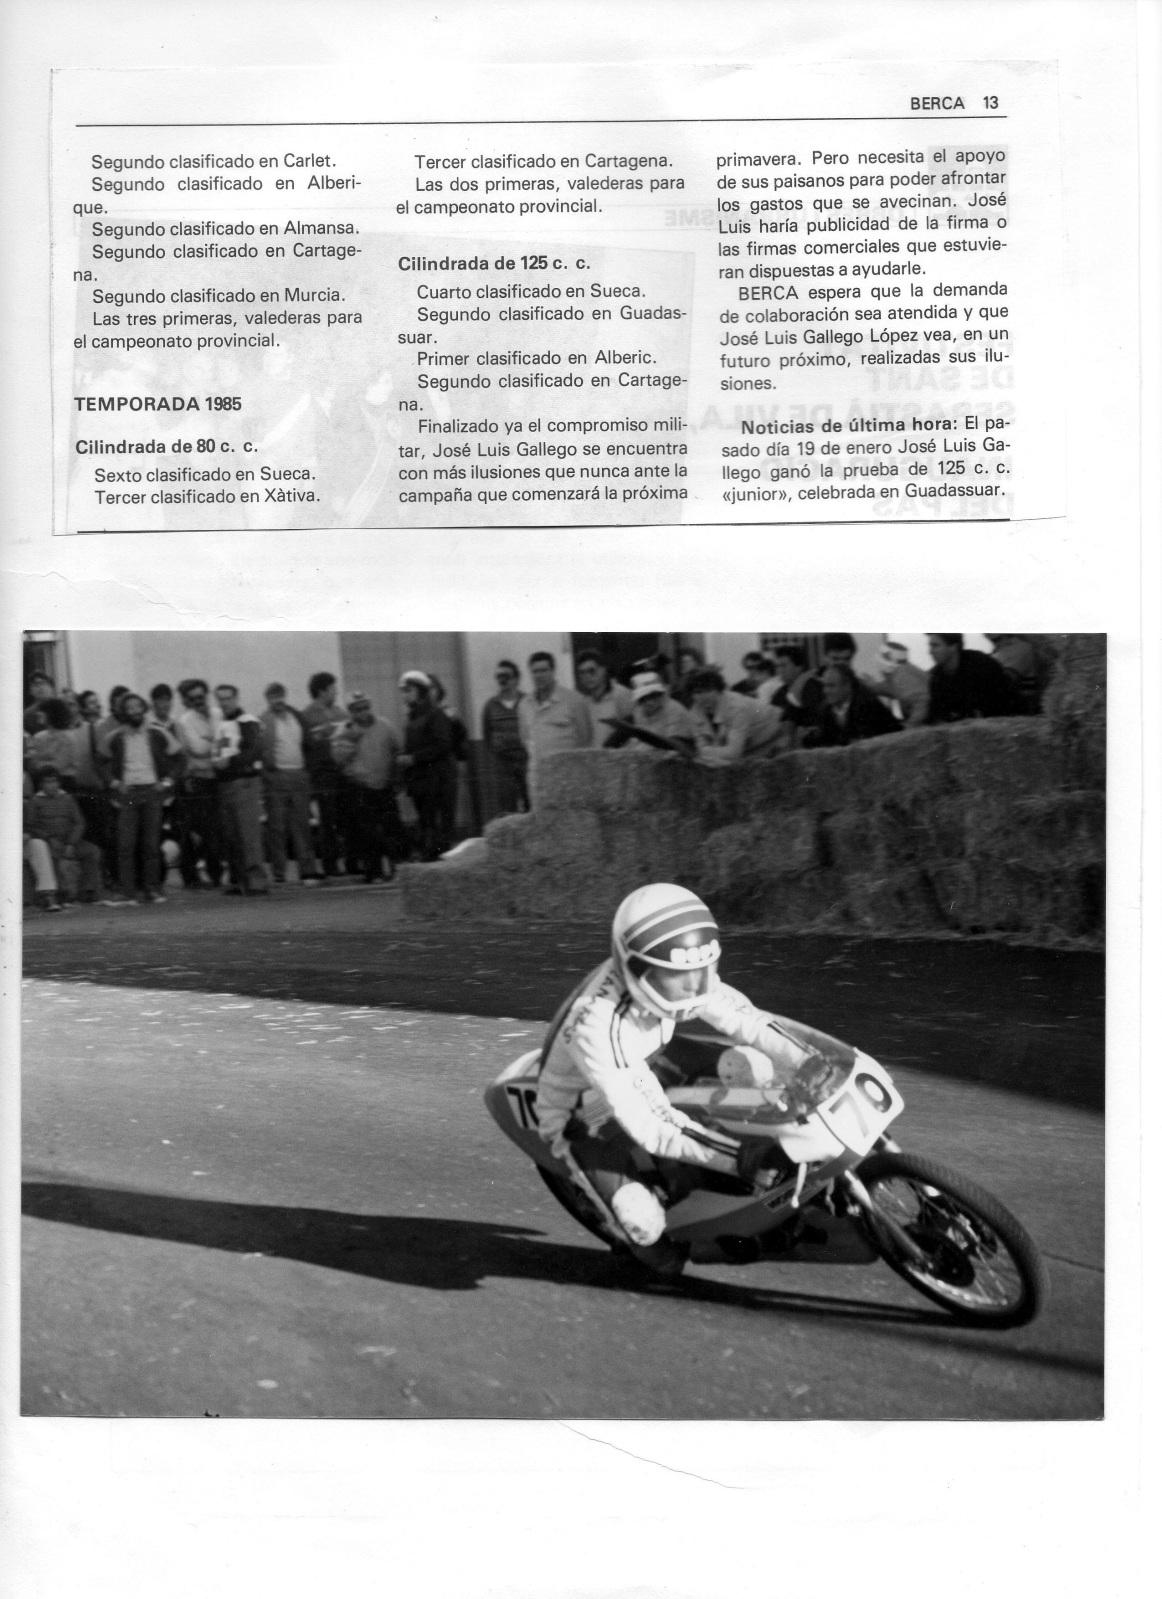 gilera - Antiguos pilotos: José Luis Gallego (V) 16as6eq